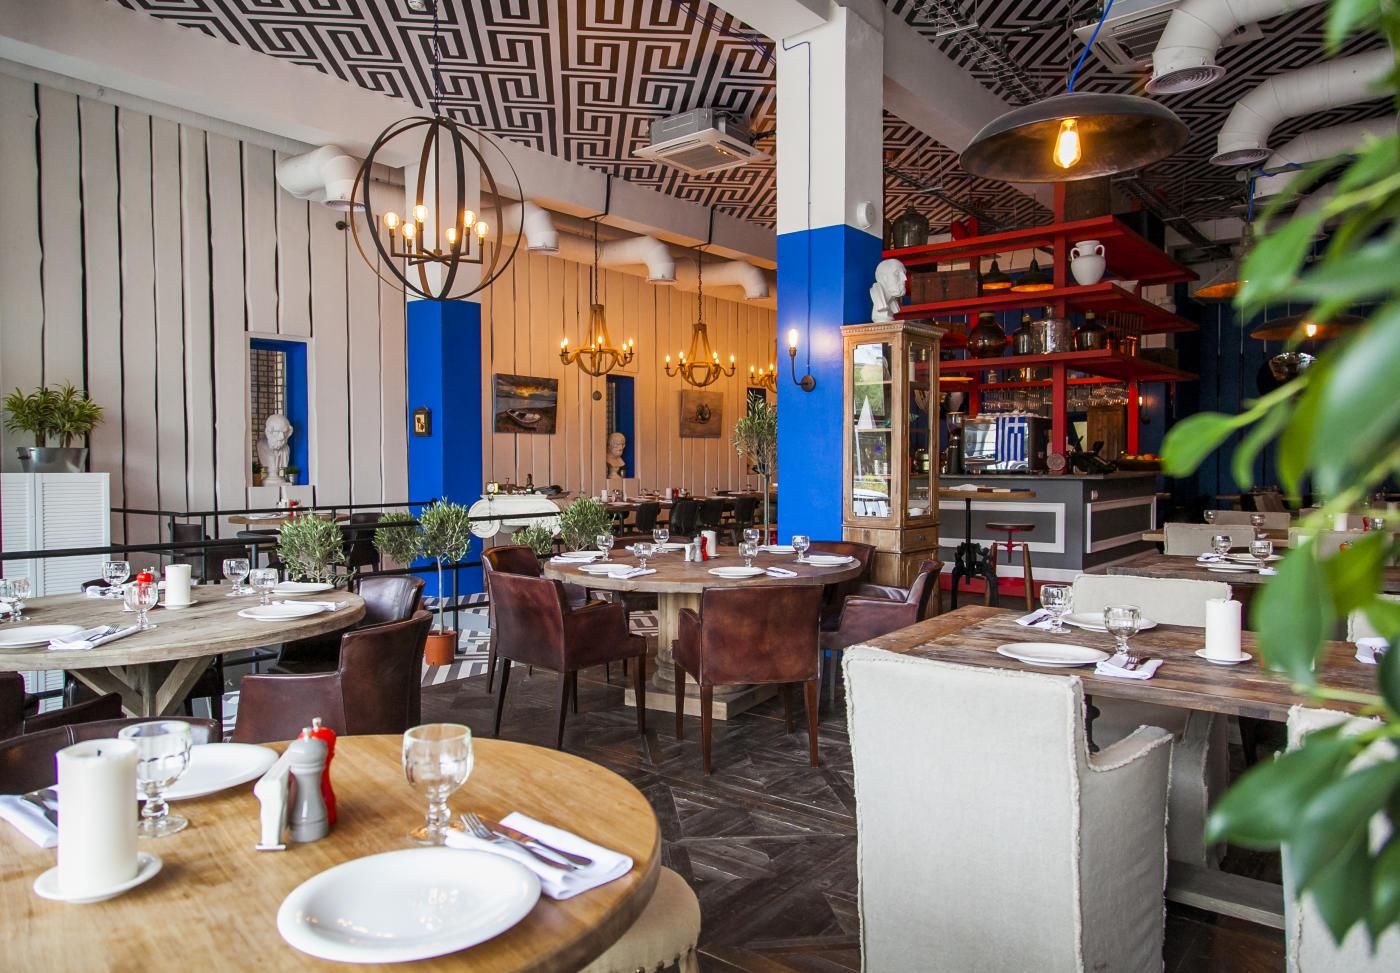 Греческий Ресторан Molon Lave (Молон Лаве) фото